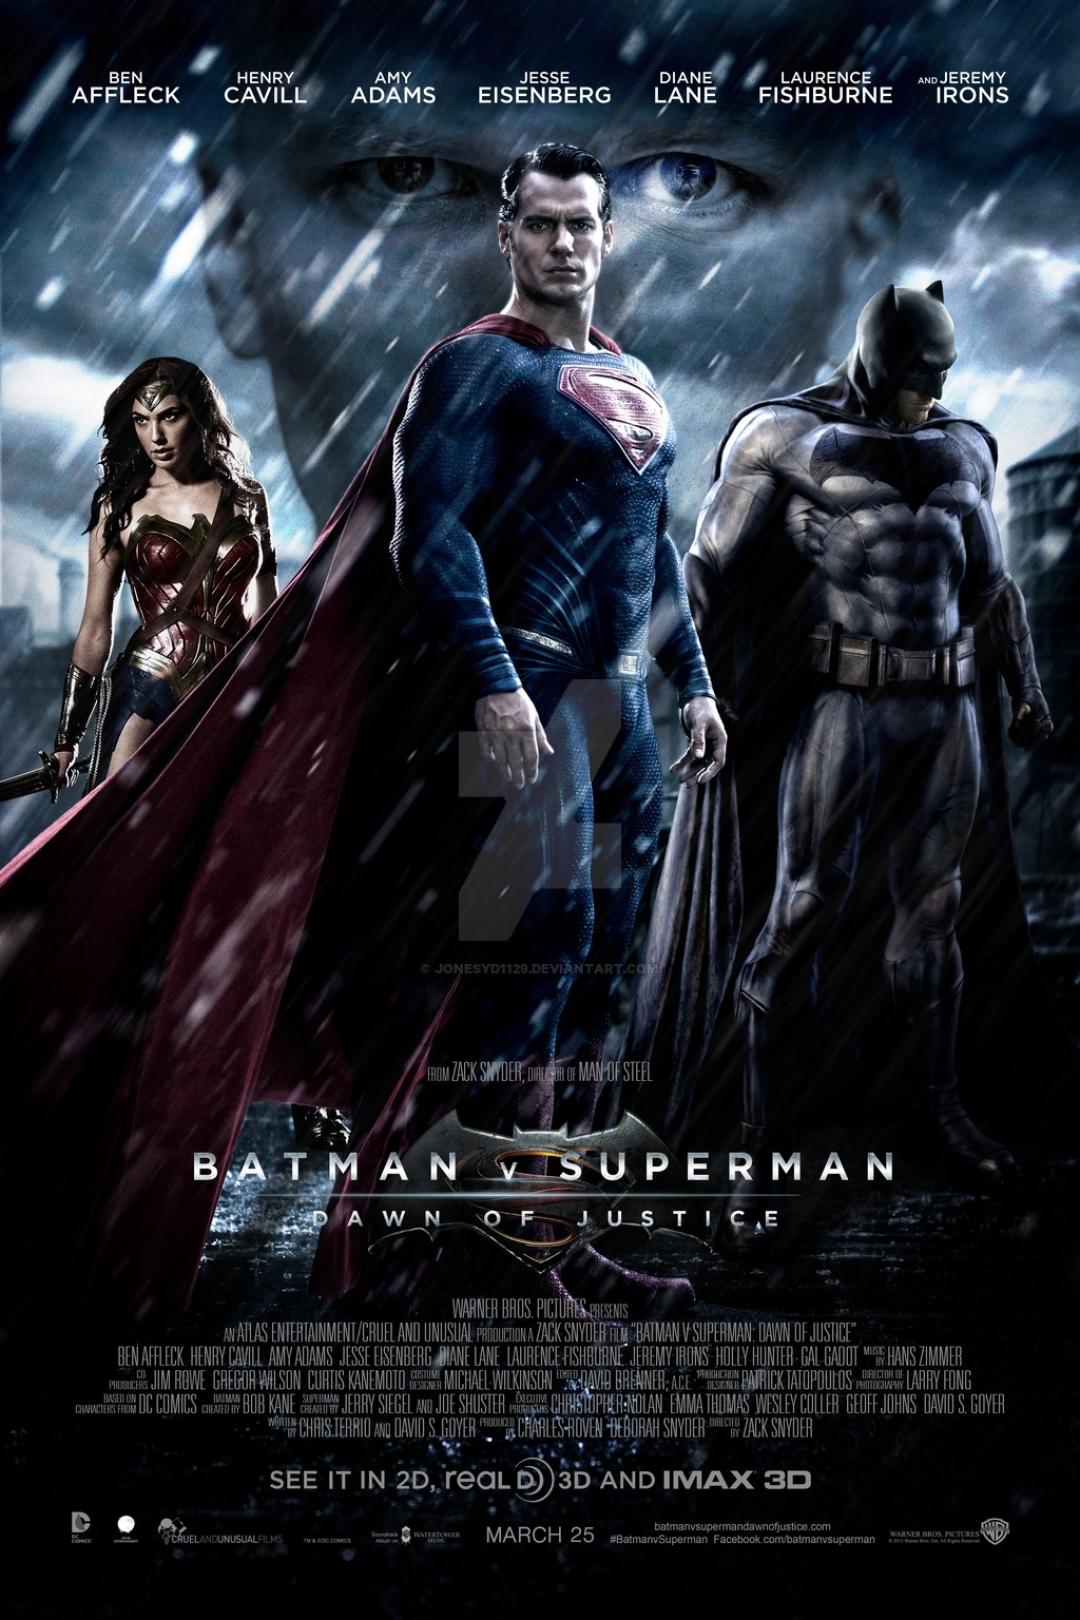 batman v superman dawn of justice movie poster batman v superman